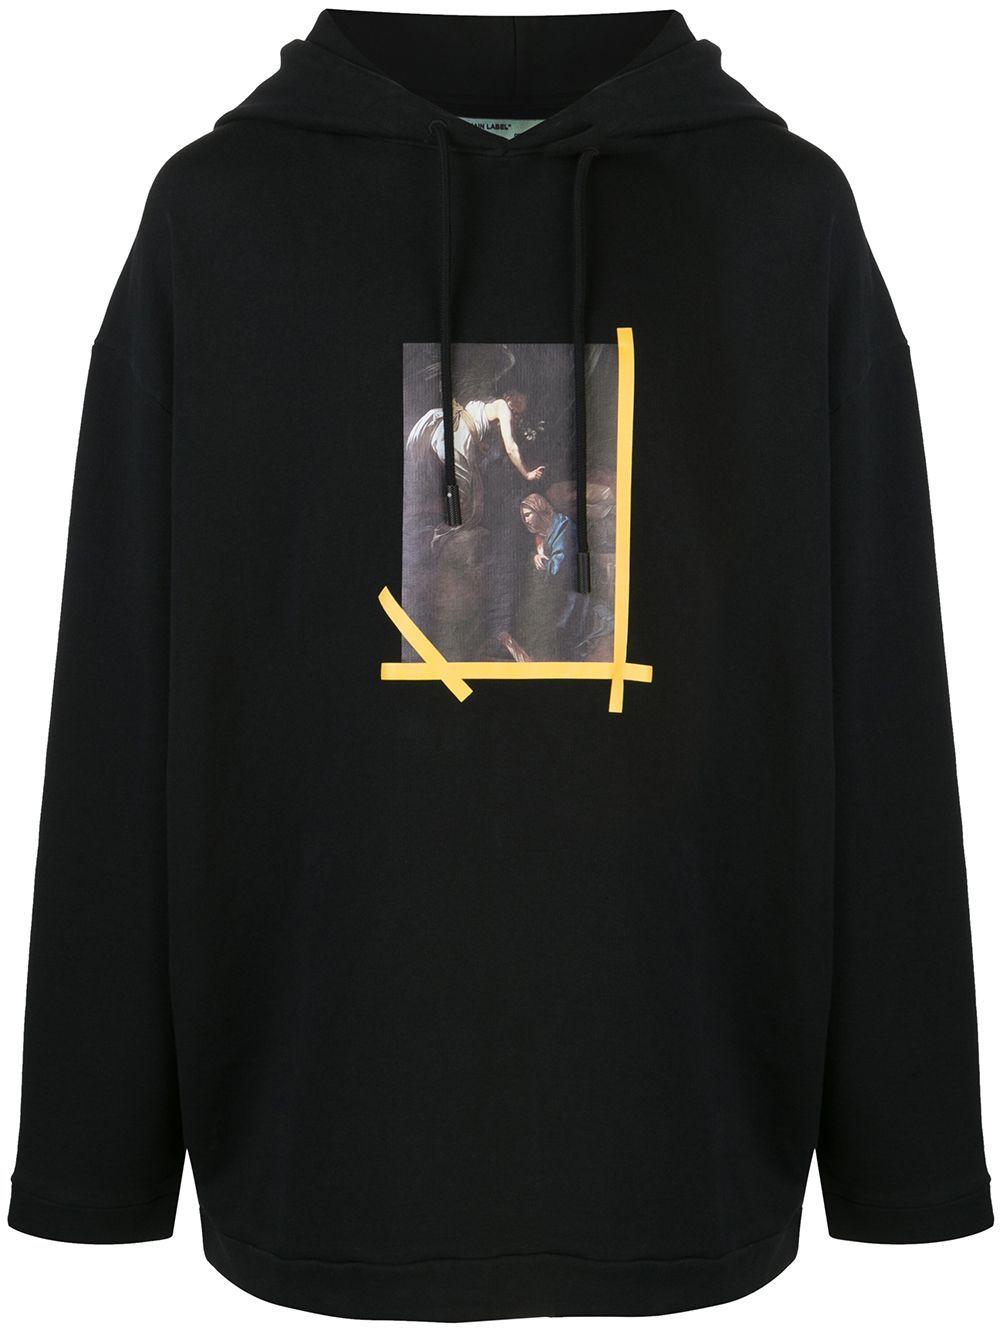 Off White Sudadera Figures Of Speech De Off White X Mca Farfetch In 2021 Off White Designer Hoodies Printed Sweatshirts [ 1334 x 1000 Pixel ]